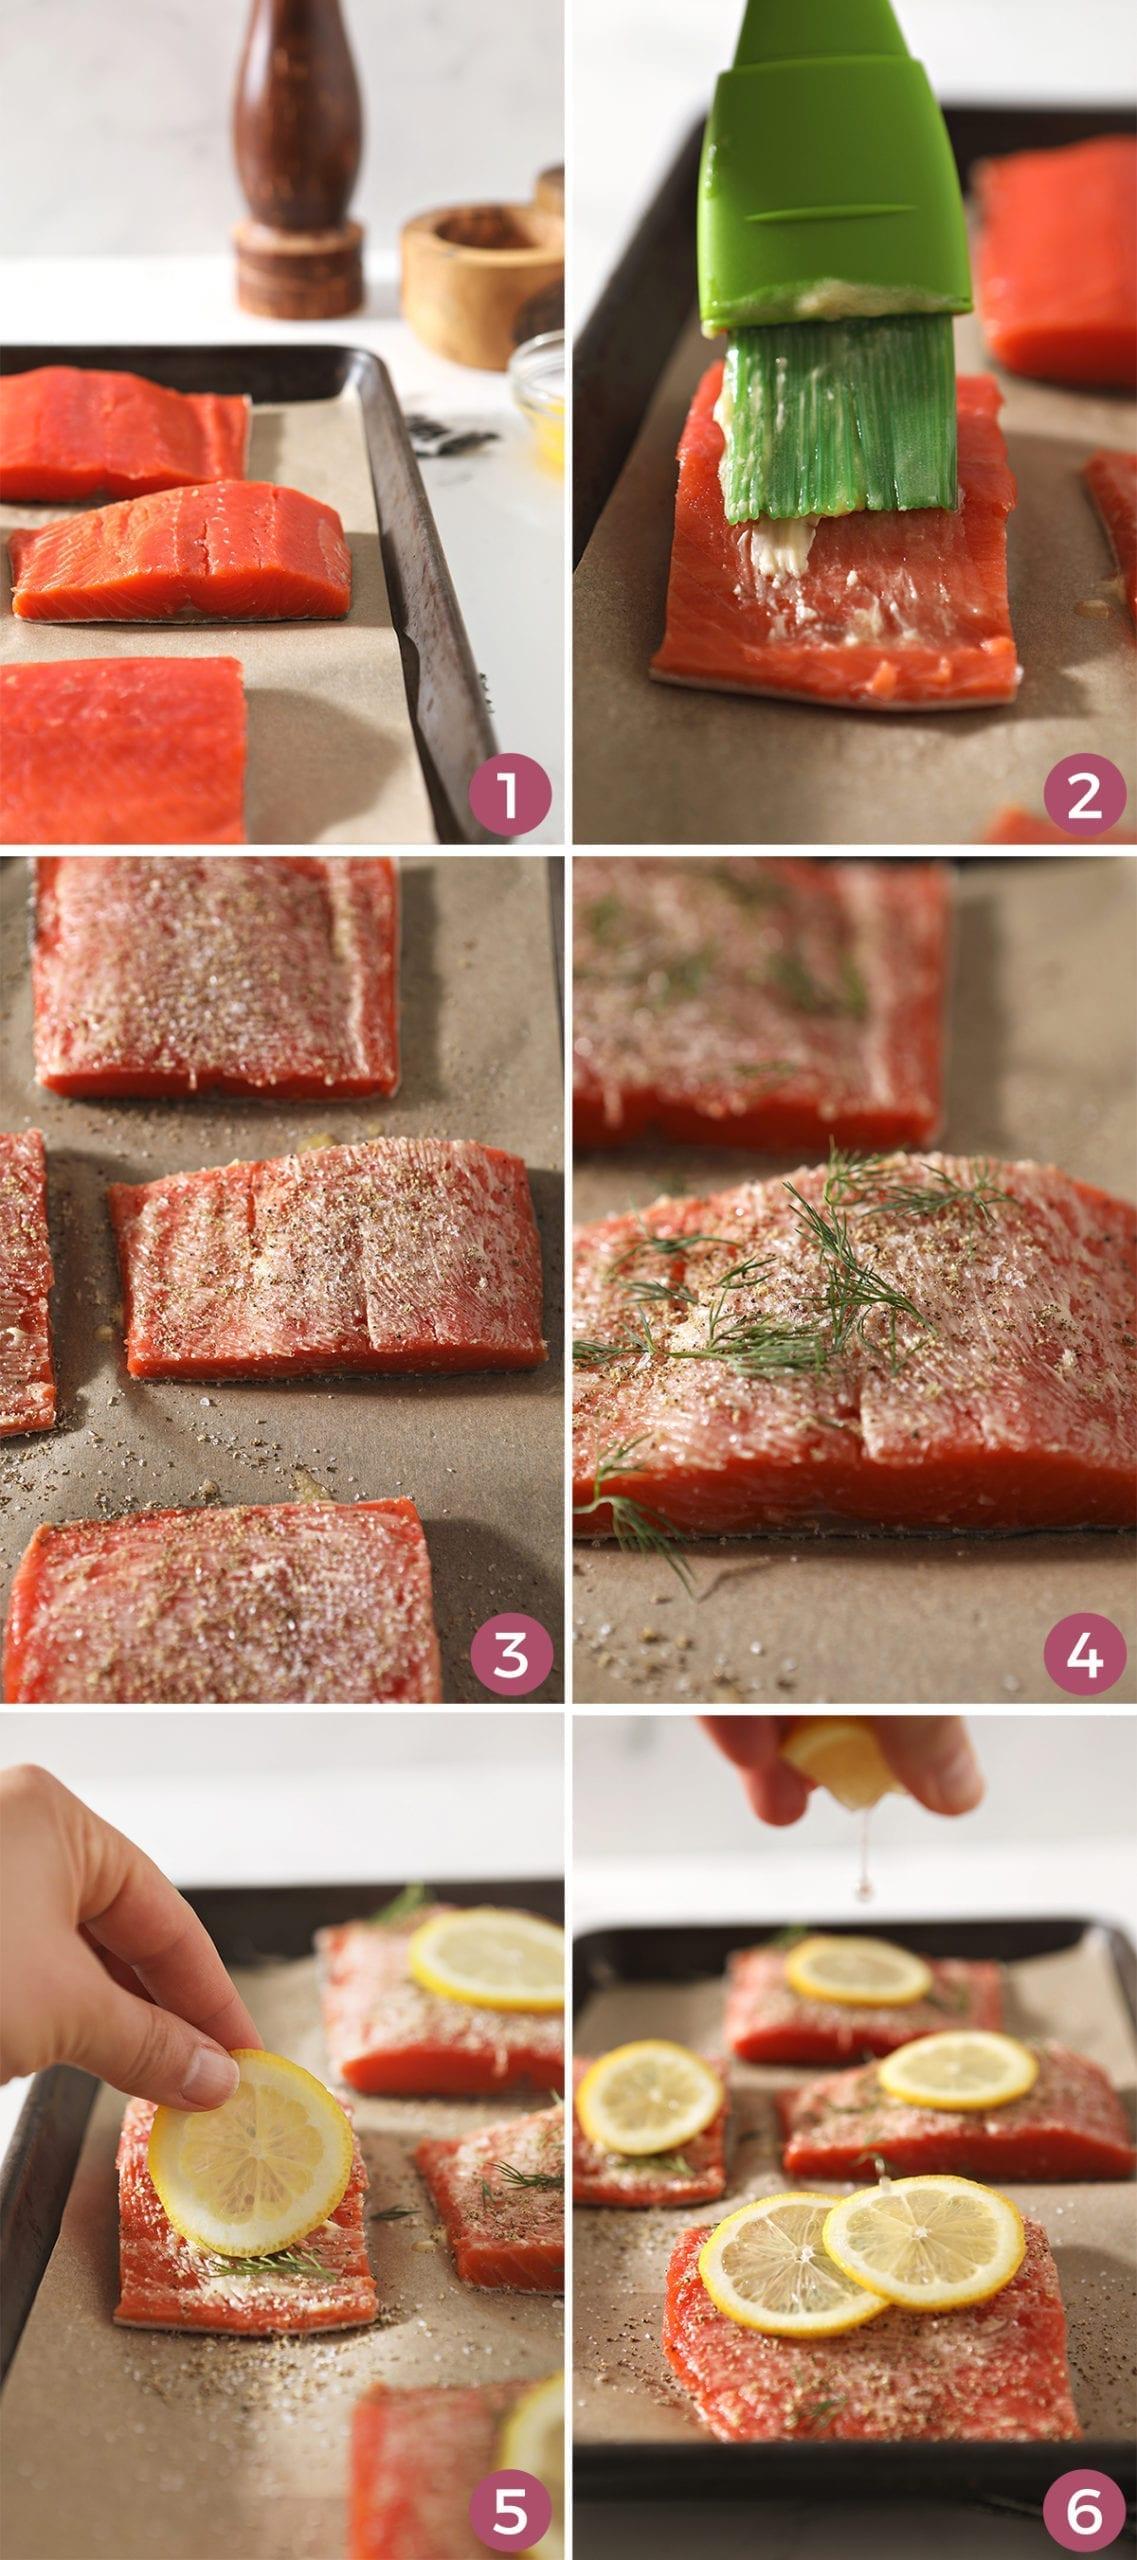 steps to make roasted salmon